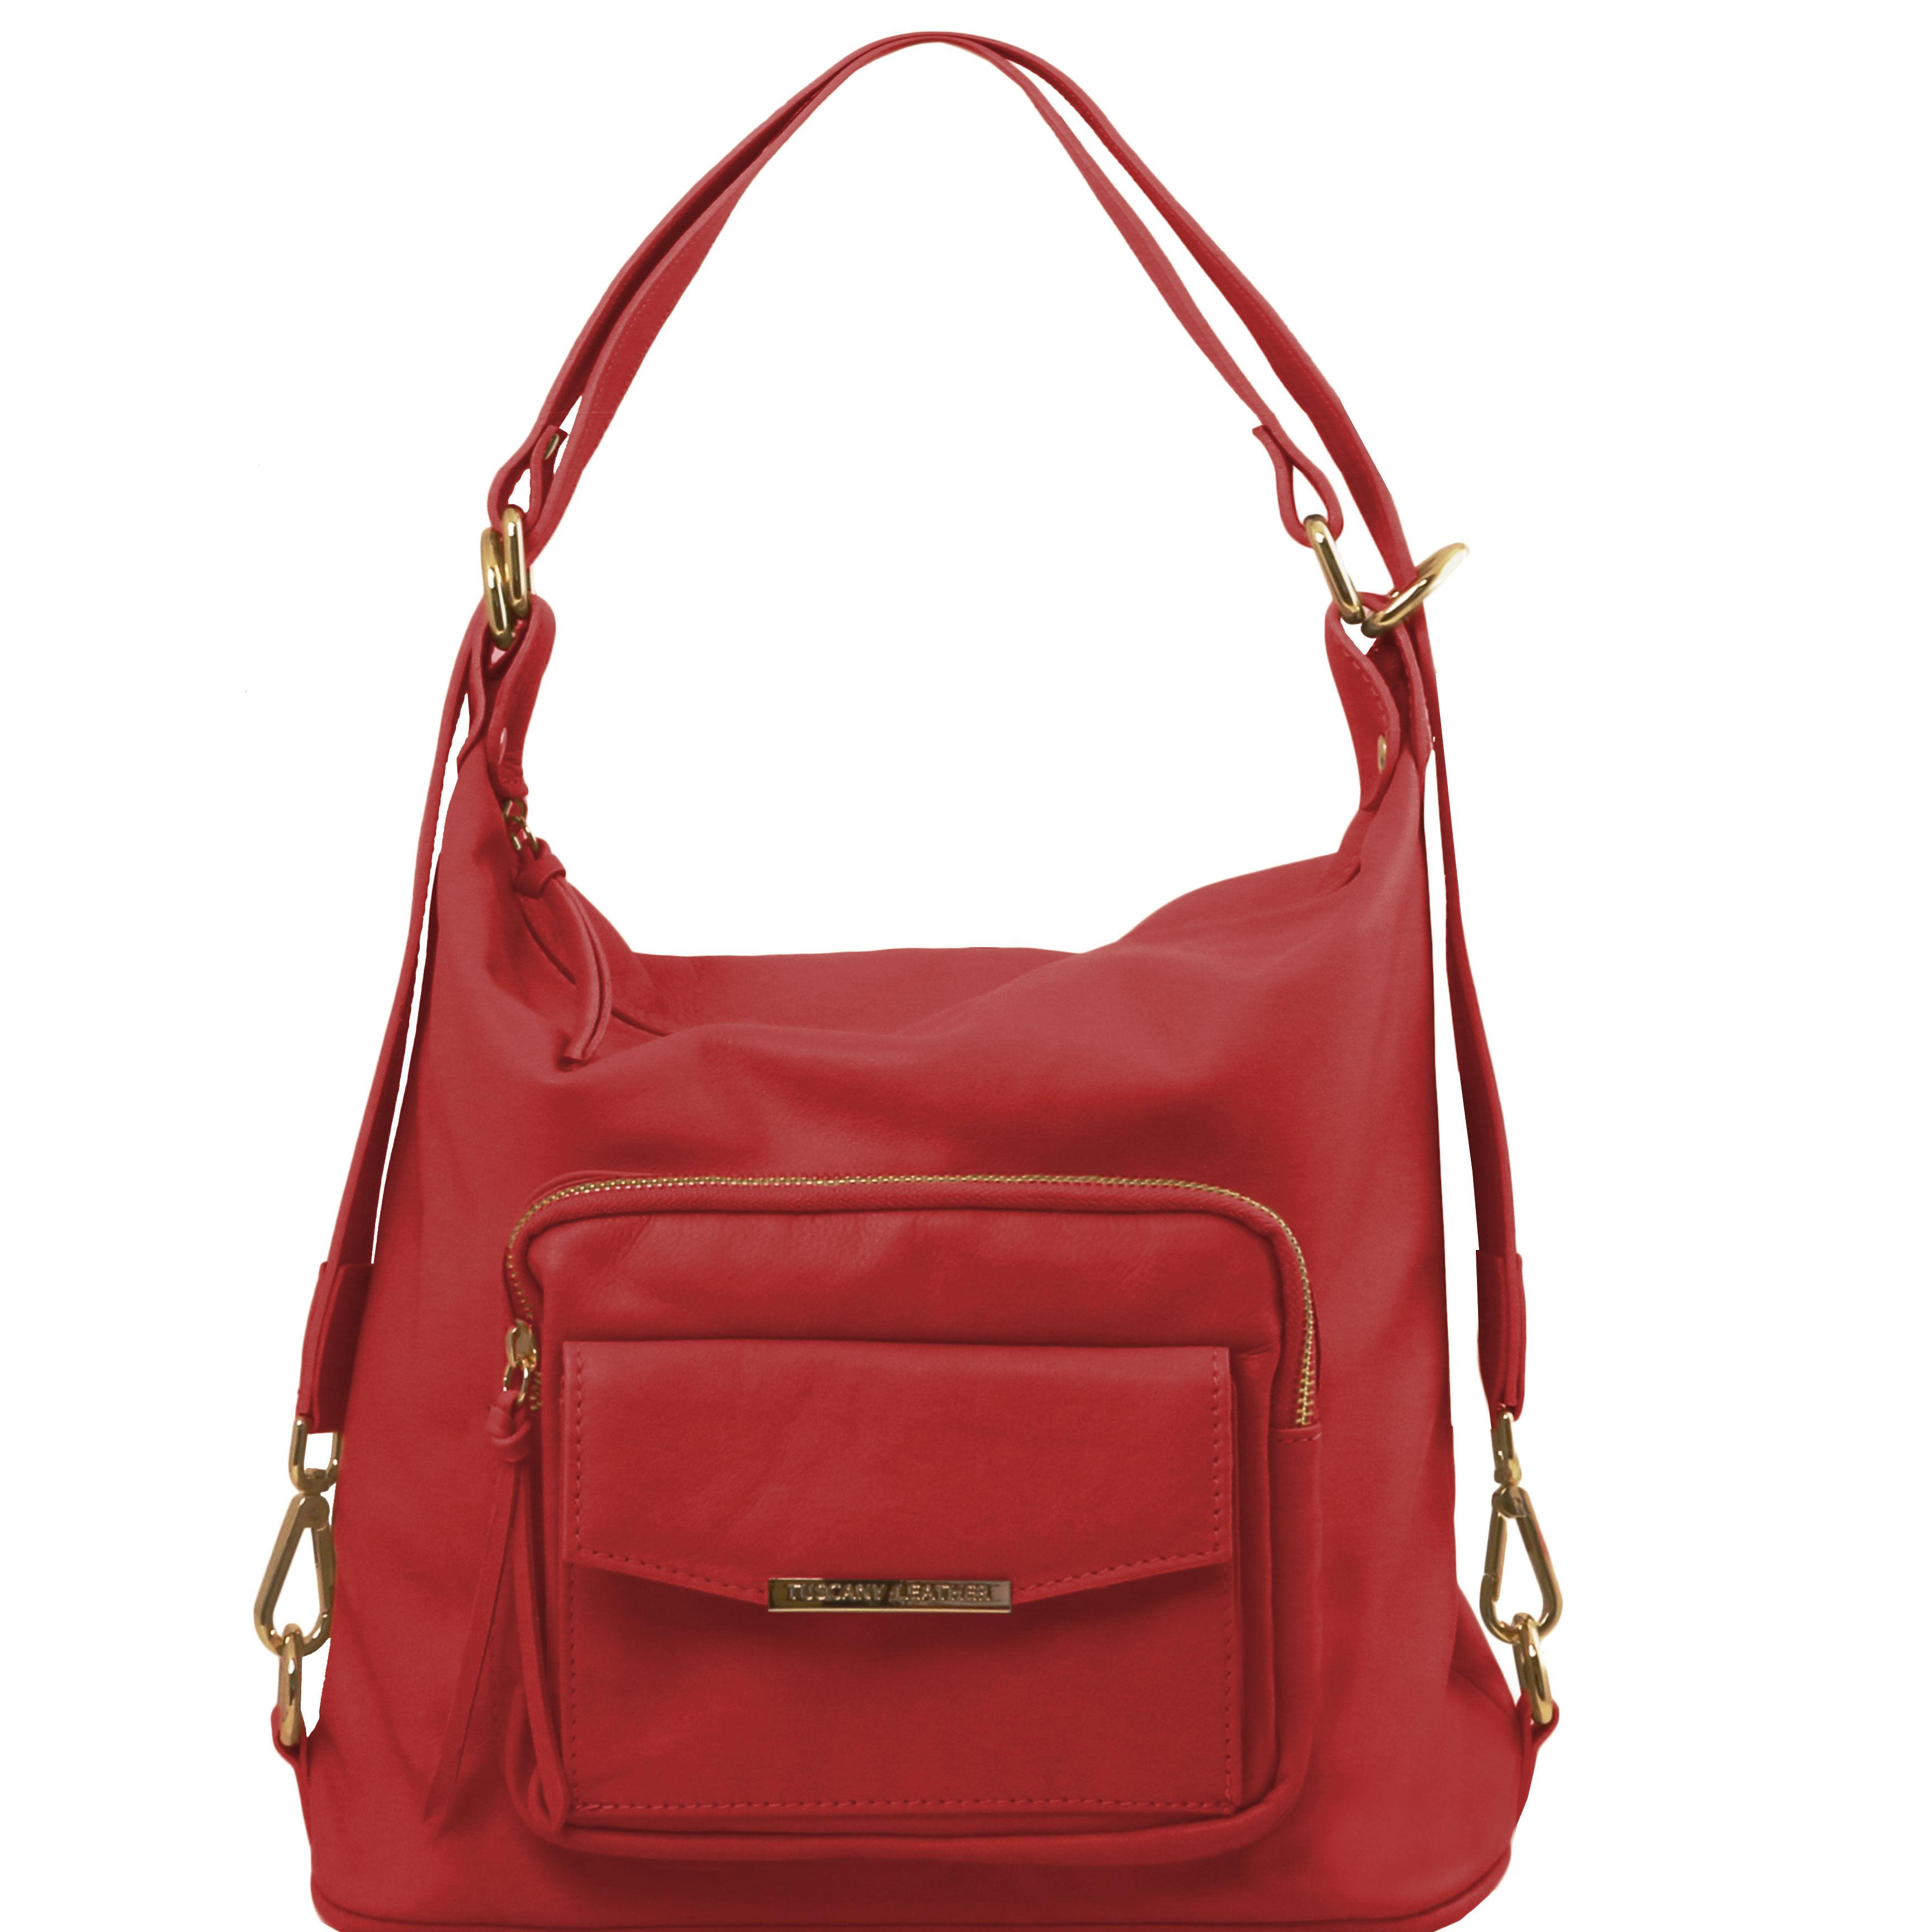 TL Bag - Geanta convertibila din piele rosie